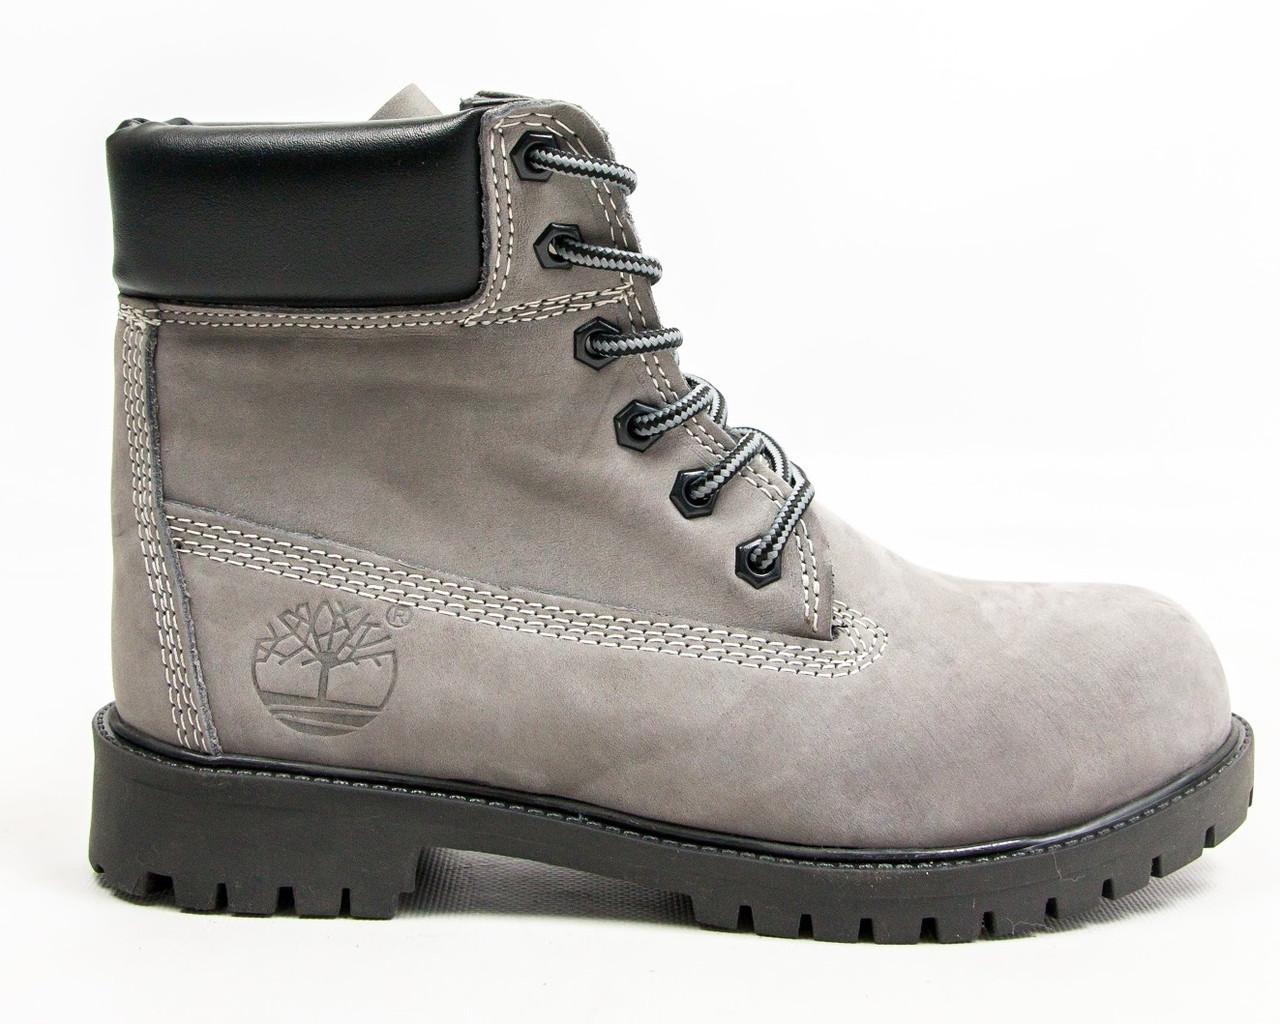 Зимние женские ботинки T1mberland 6 inch gray black (Реплика ААА+)